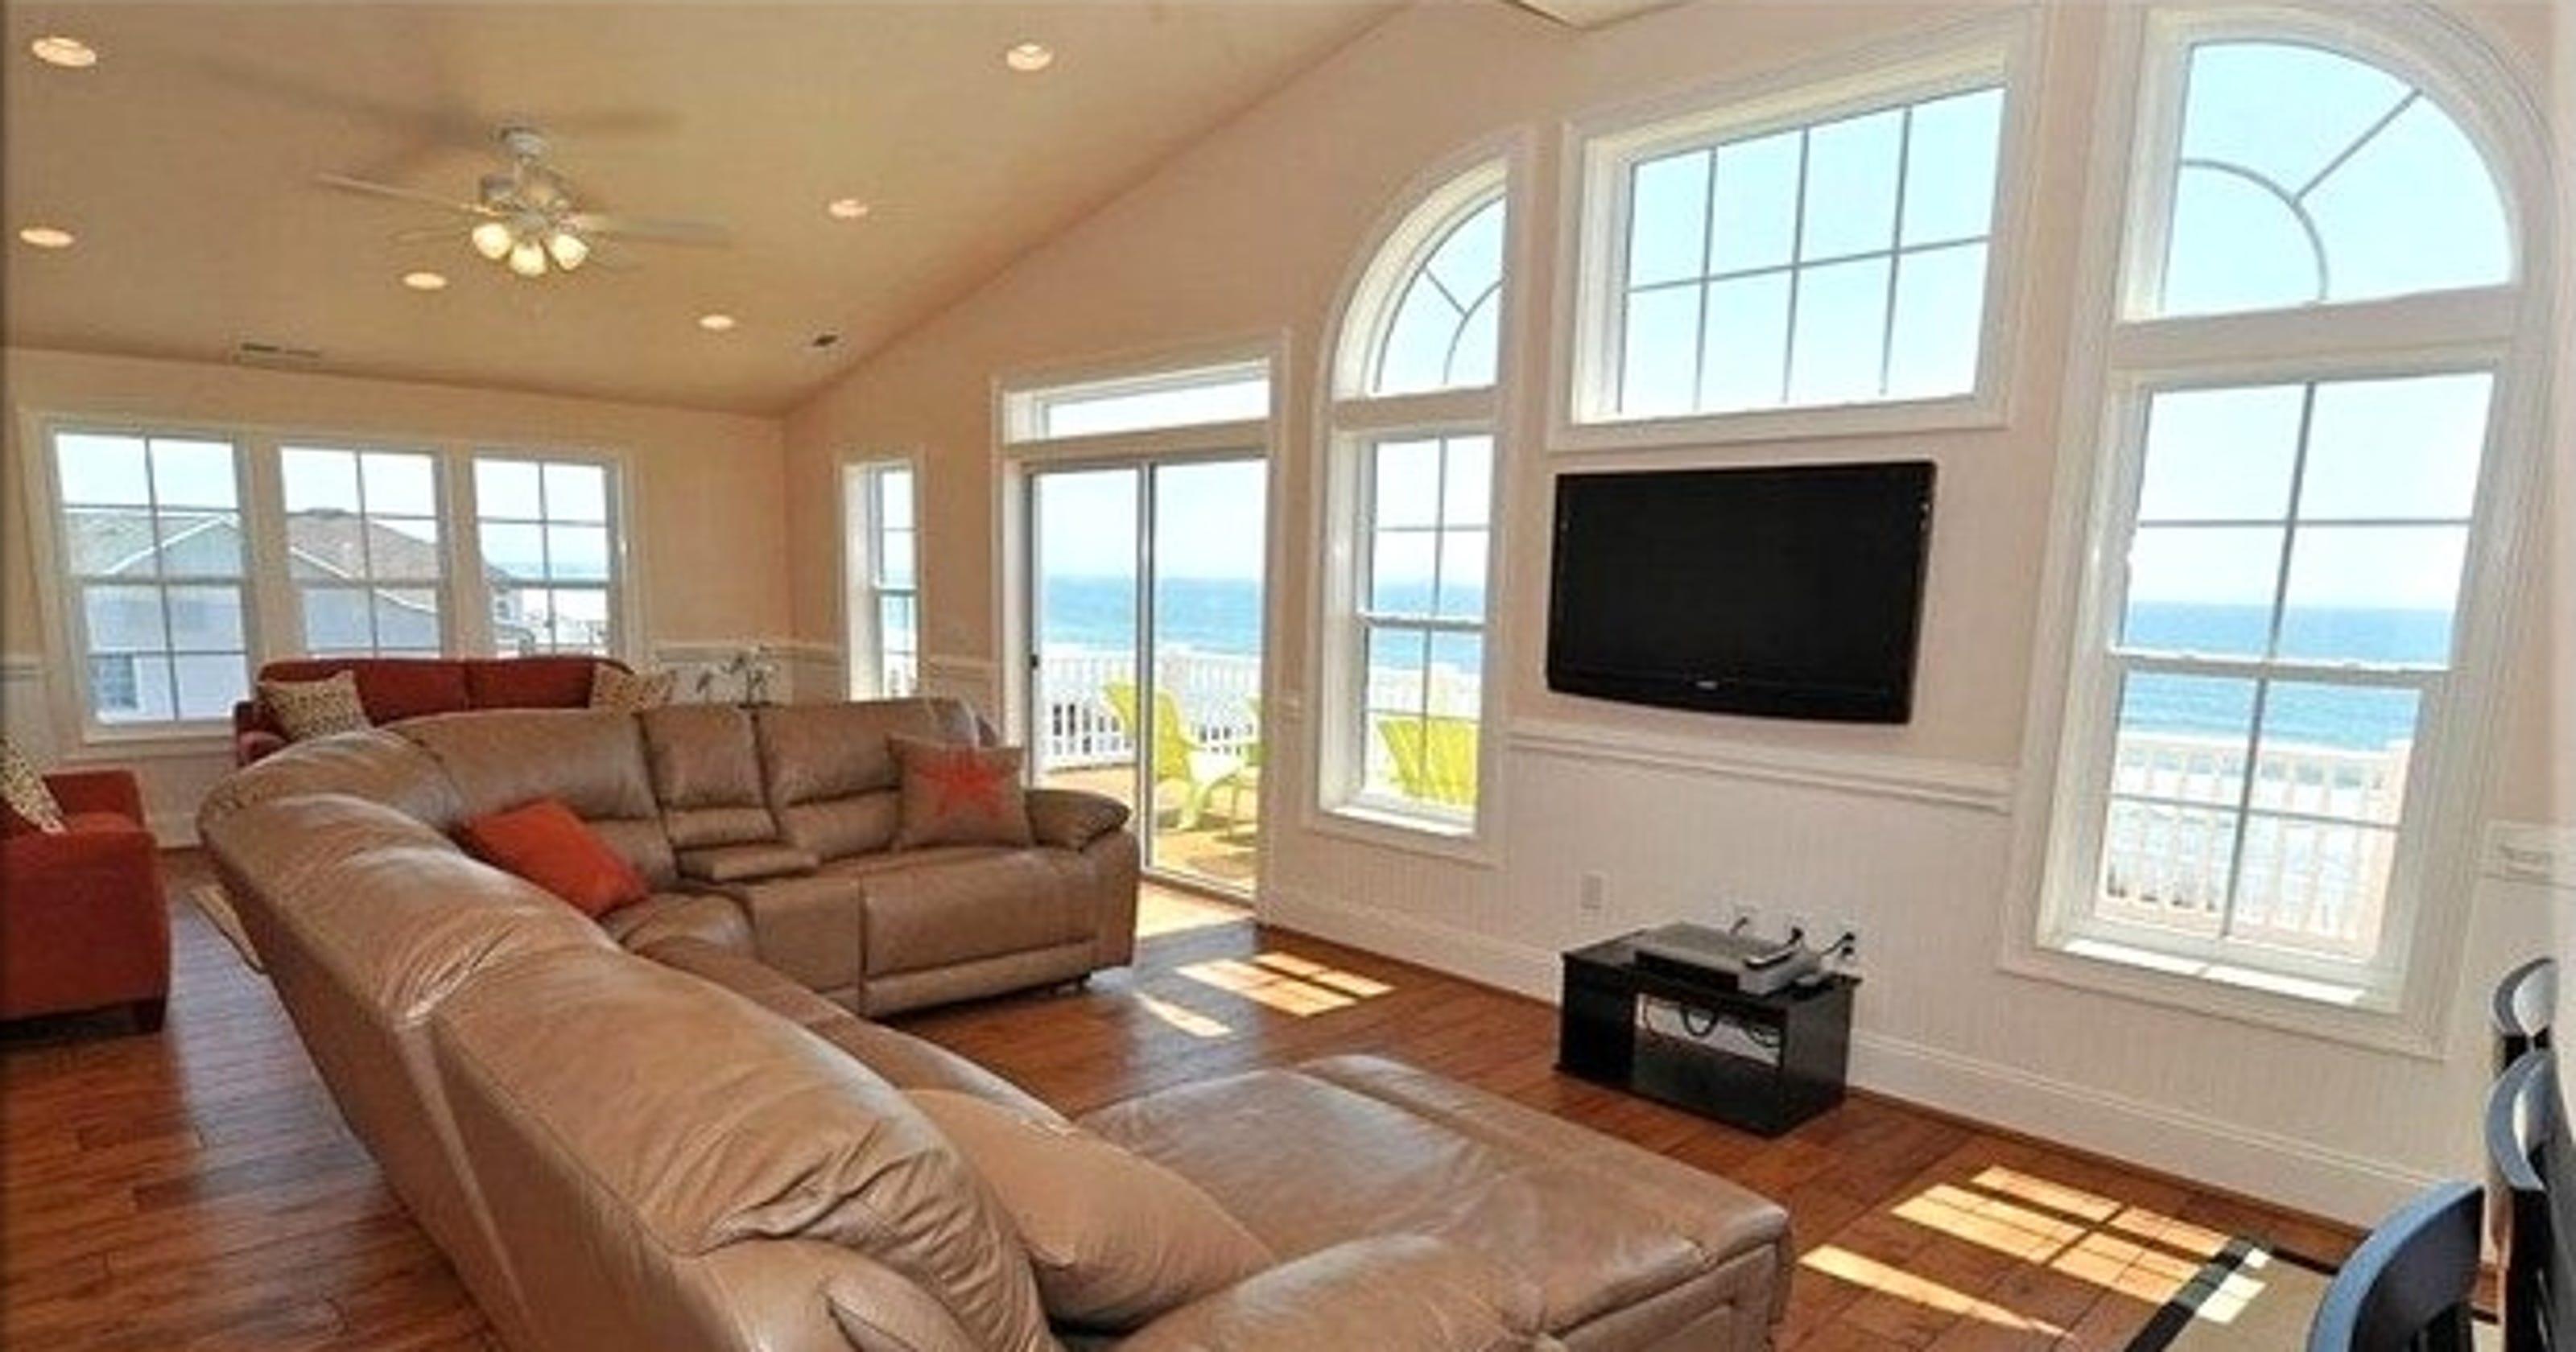 Beach house bonanza: Rent in September for big savings